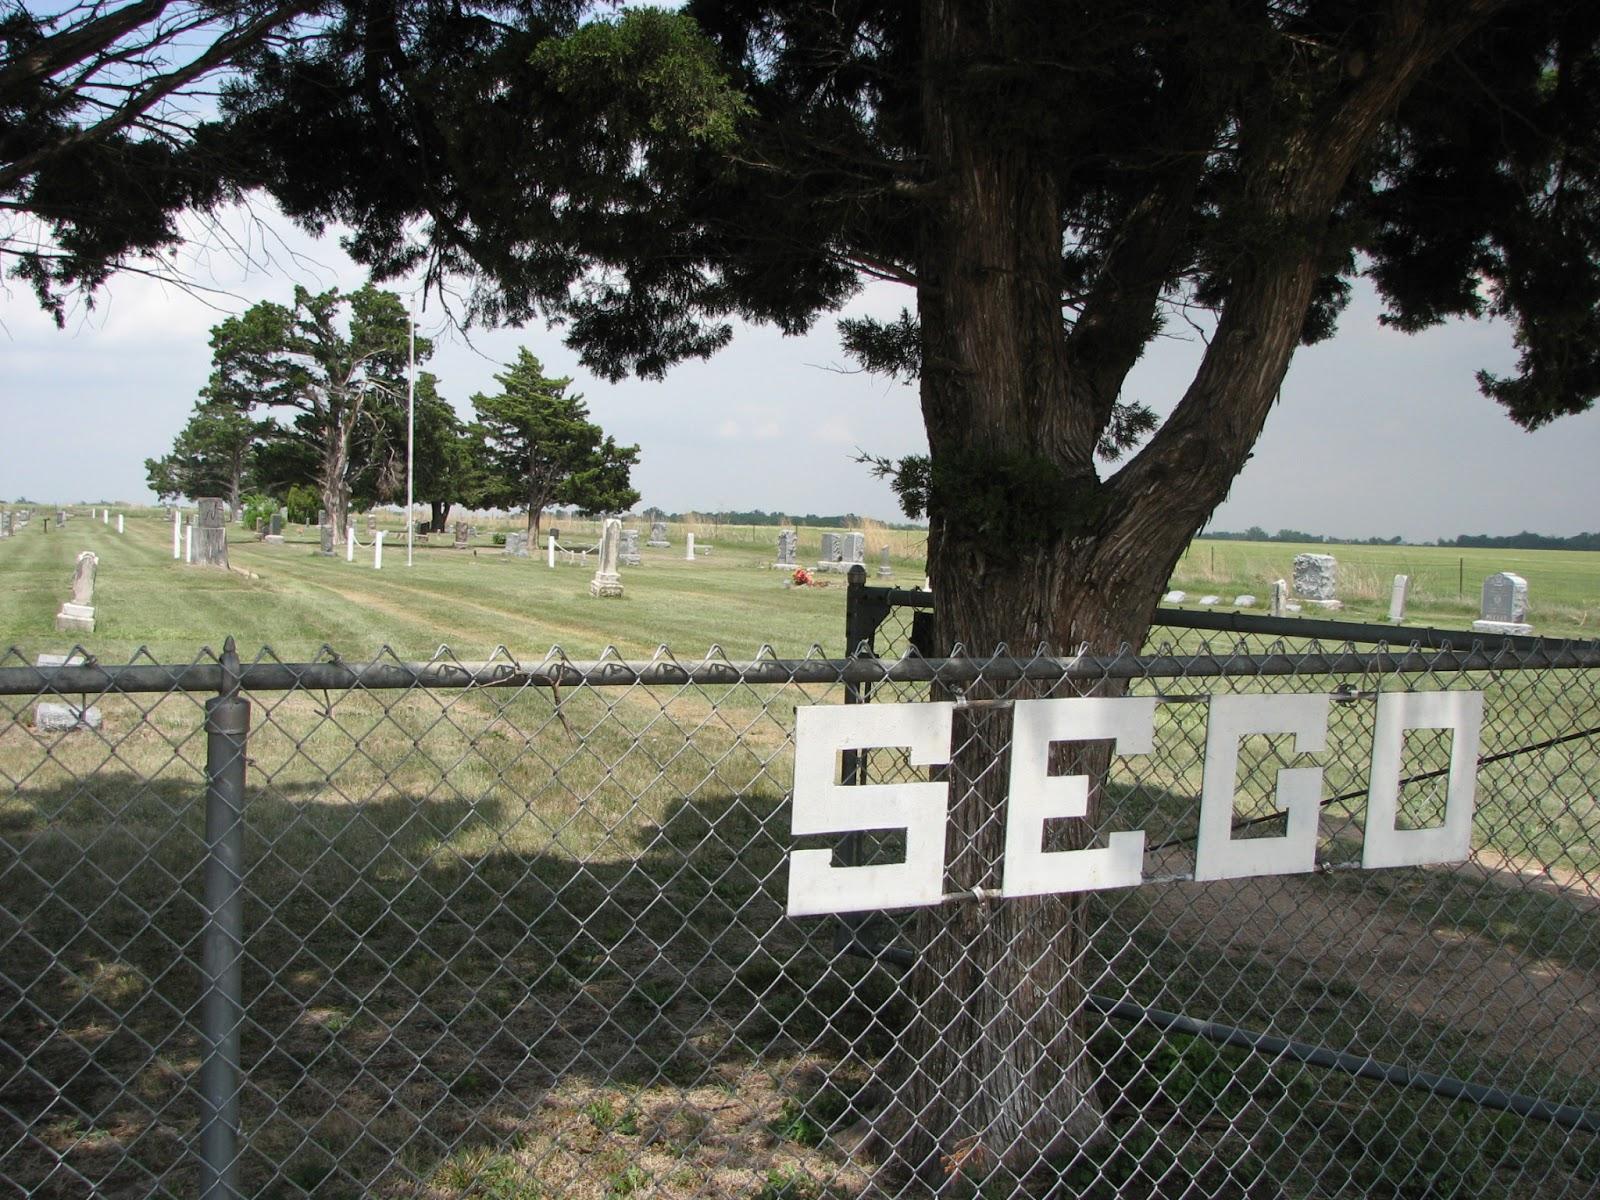 Kansas reno county turon - Reno County S Sego Nothing But A Graveyard